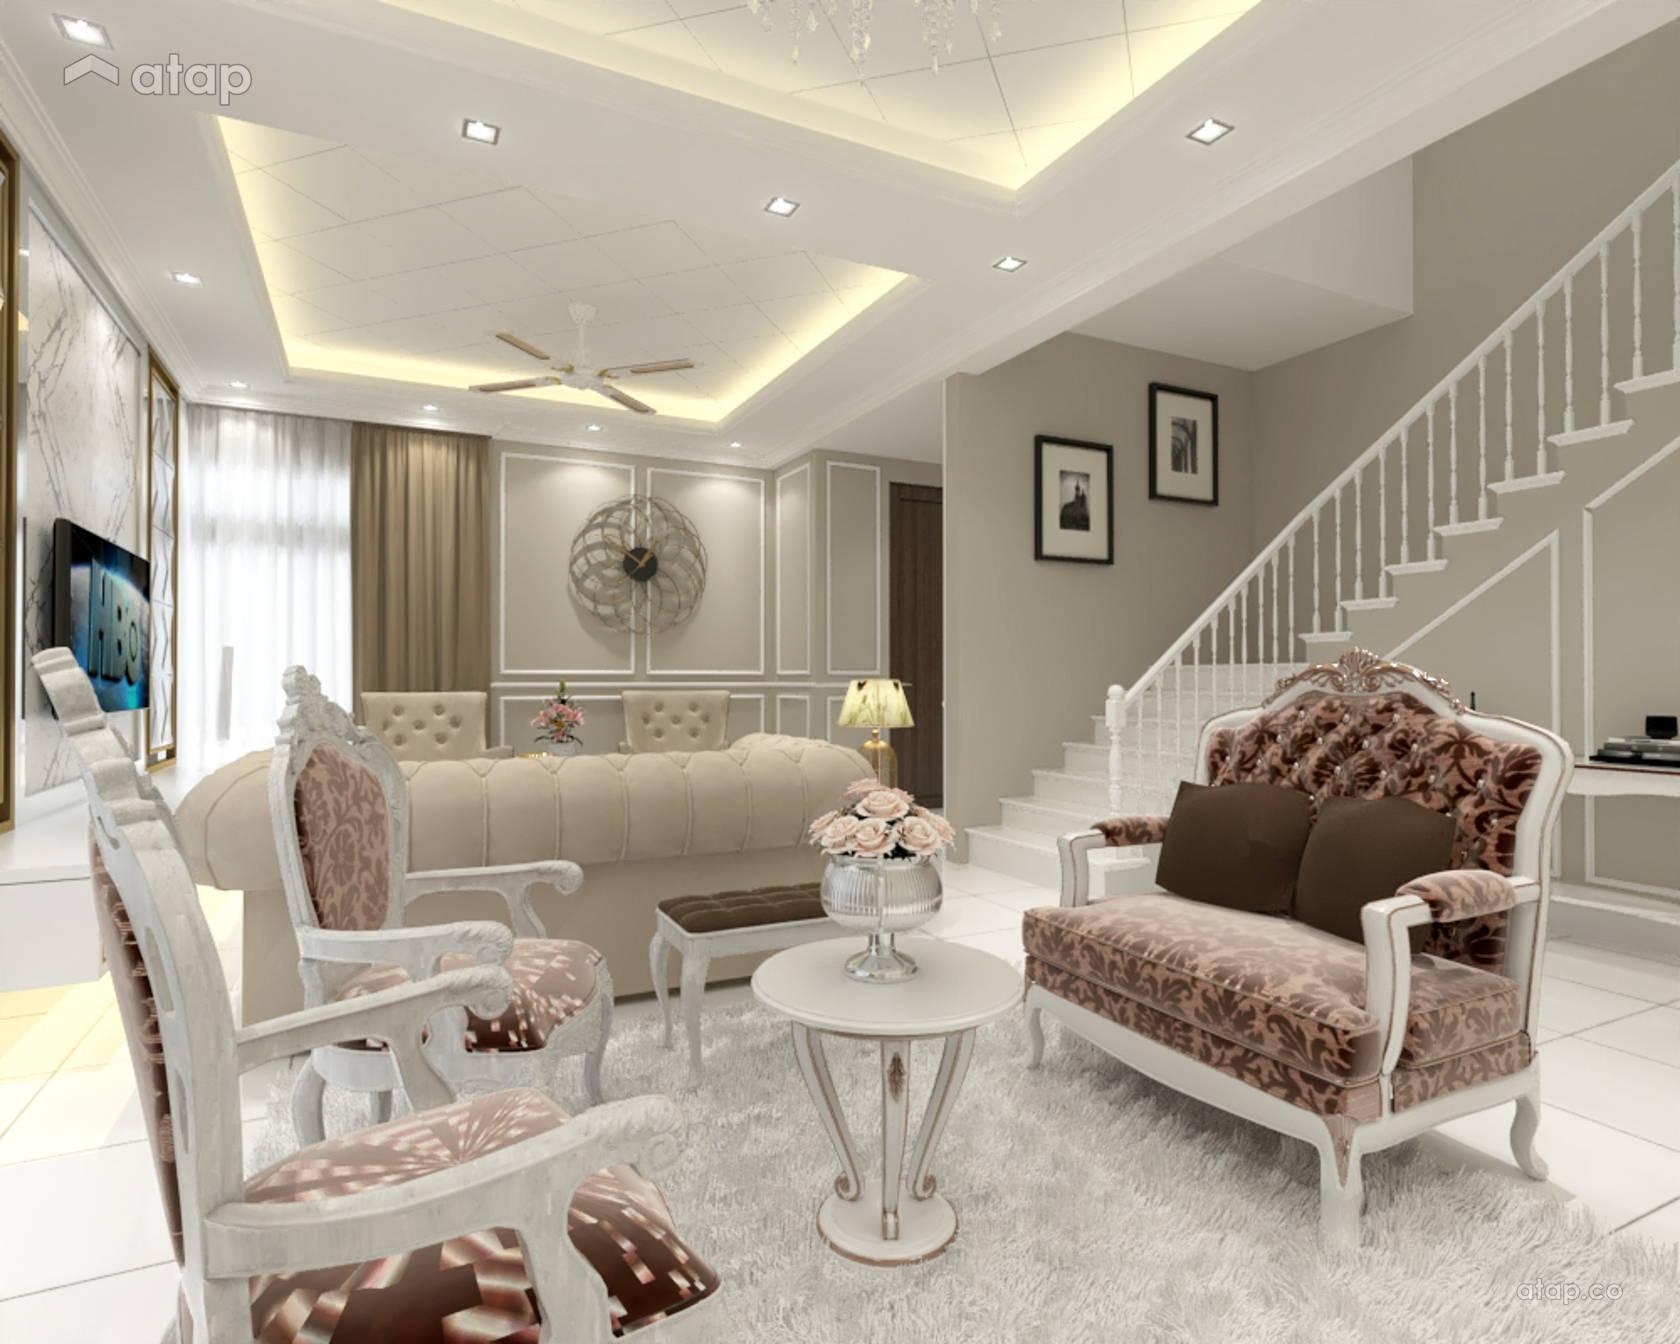 Modern Victorian Interior Design Renovation Ideas Photos And Price In Malaysia Atap Co